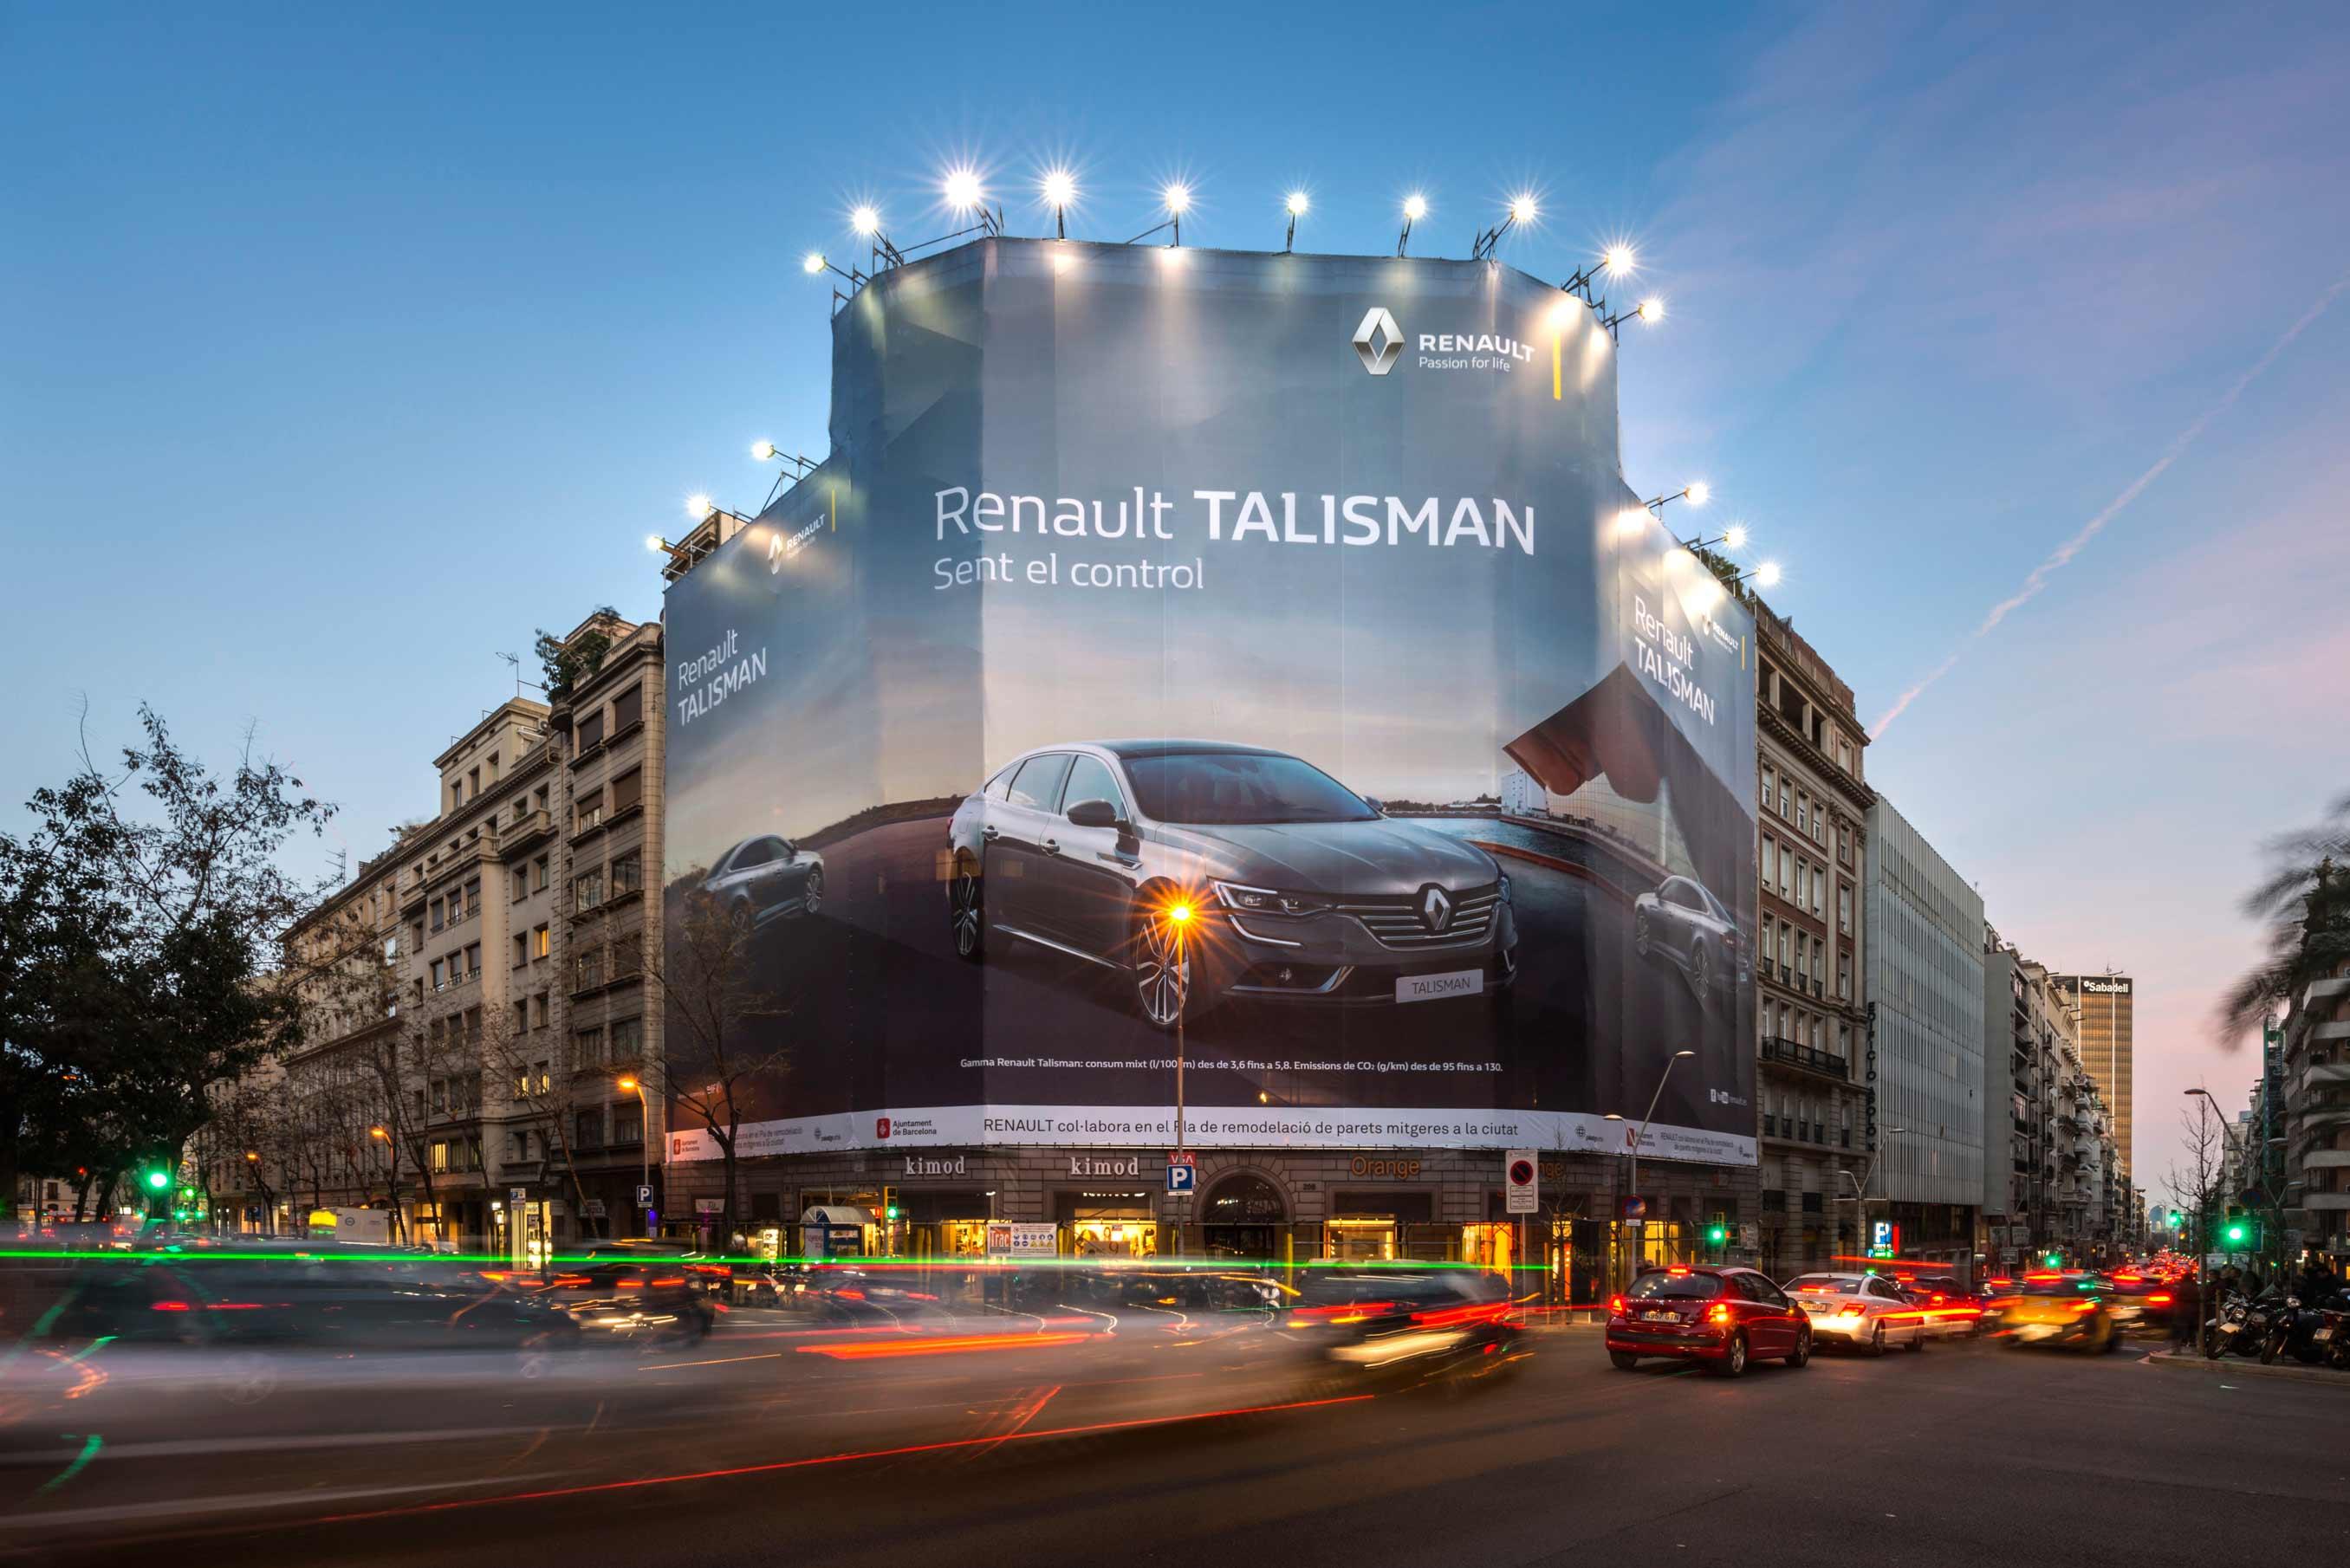 lona-publicitaria-barcelona-balmes-206-renault-talisman-vsa-comunicacion